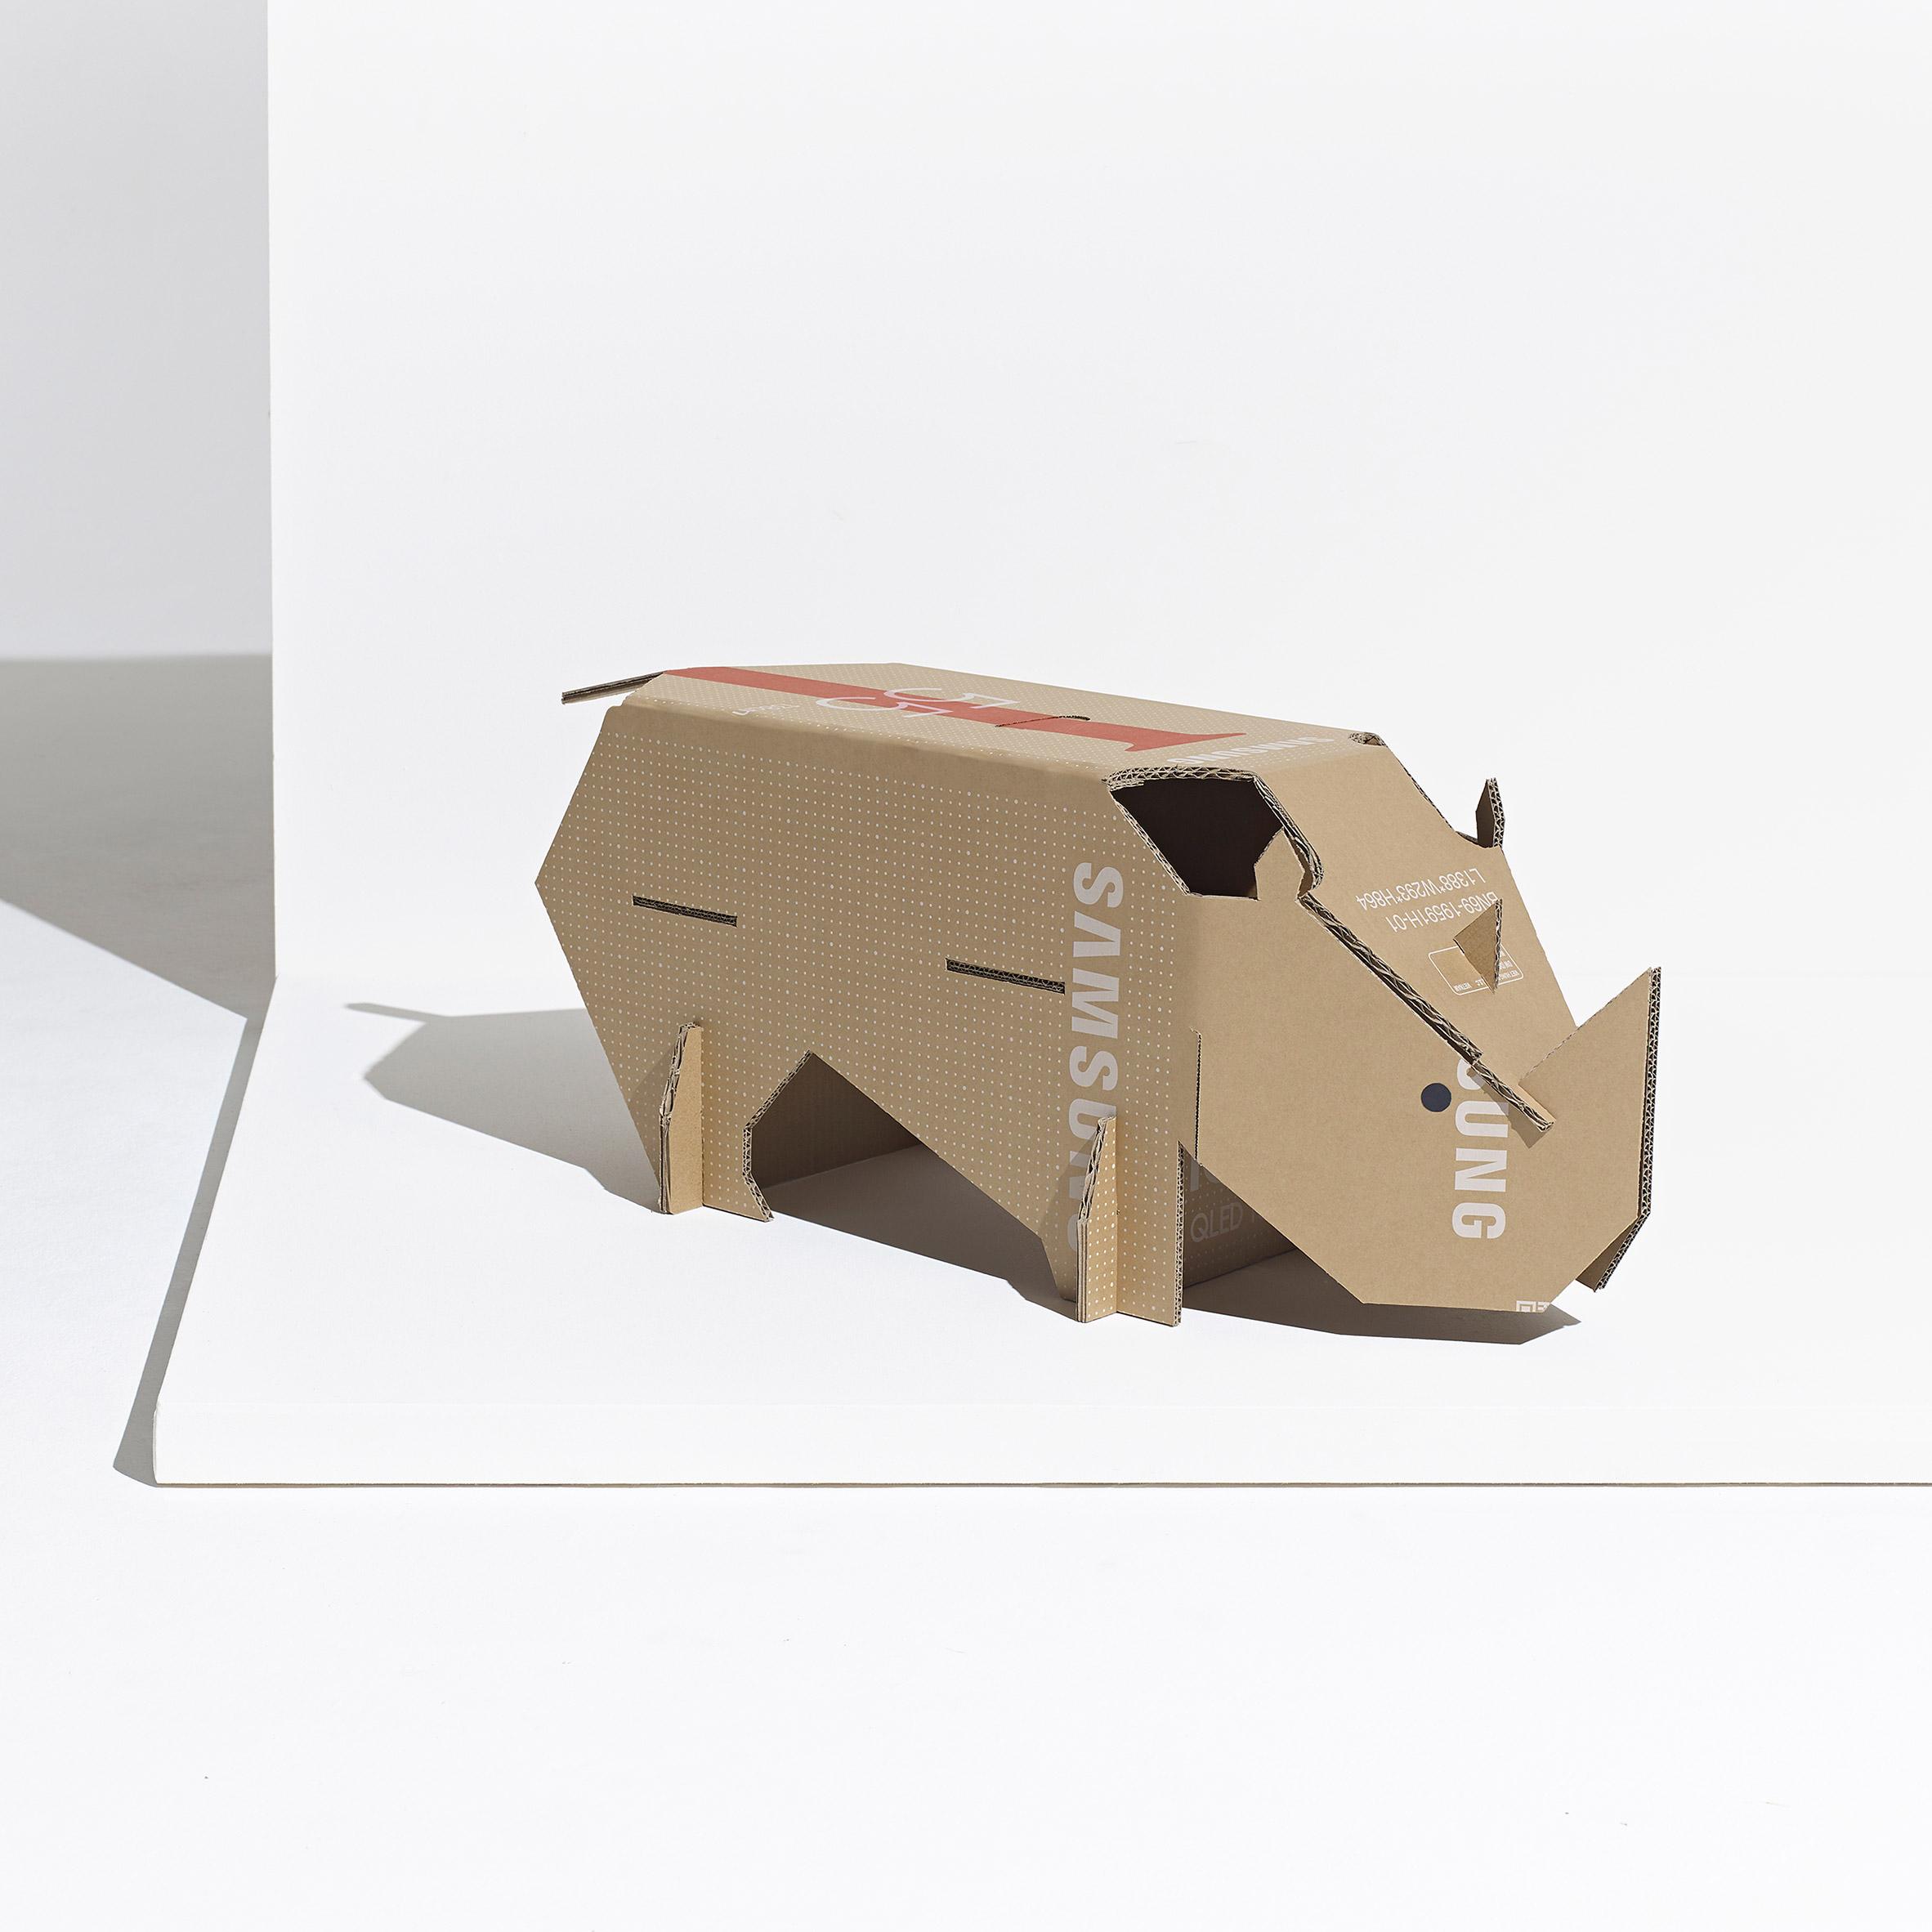 Endangered Animals by Sarah Willemart and Matthieu Muller